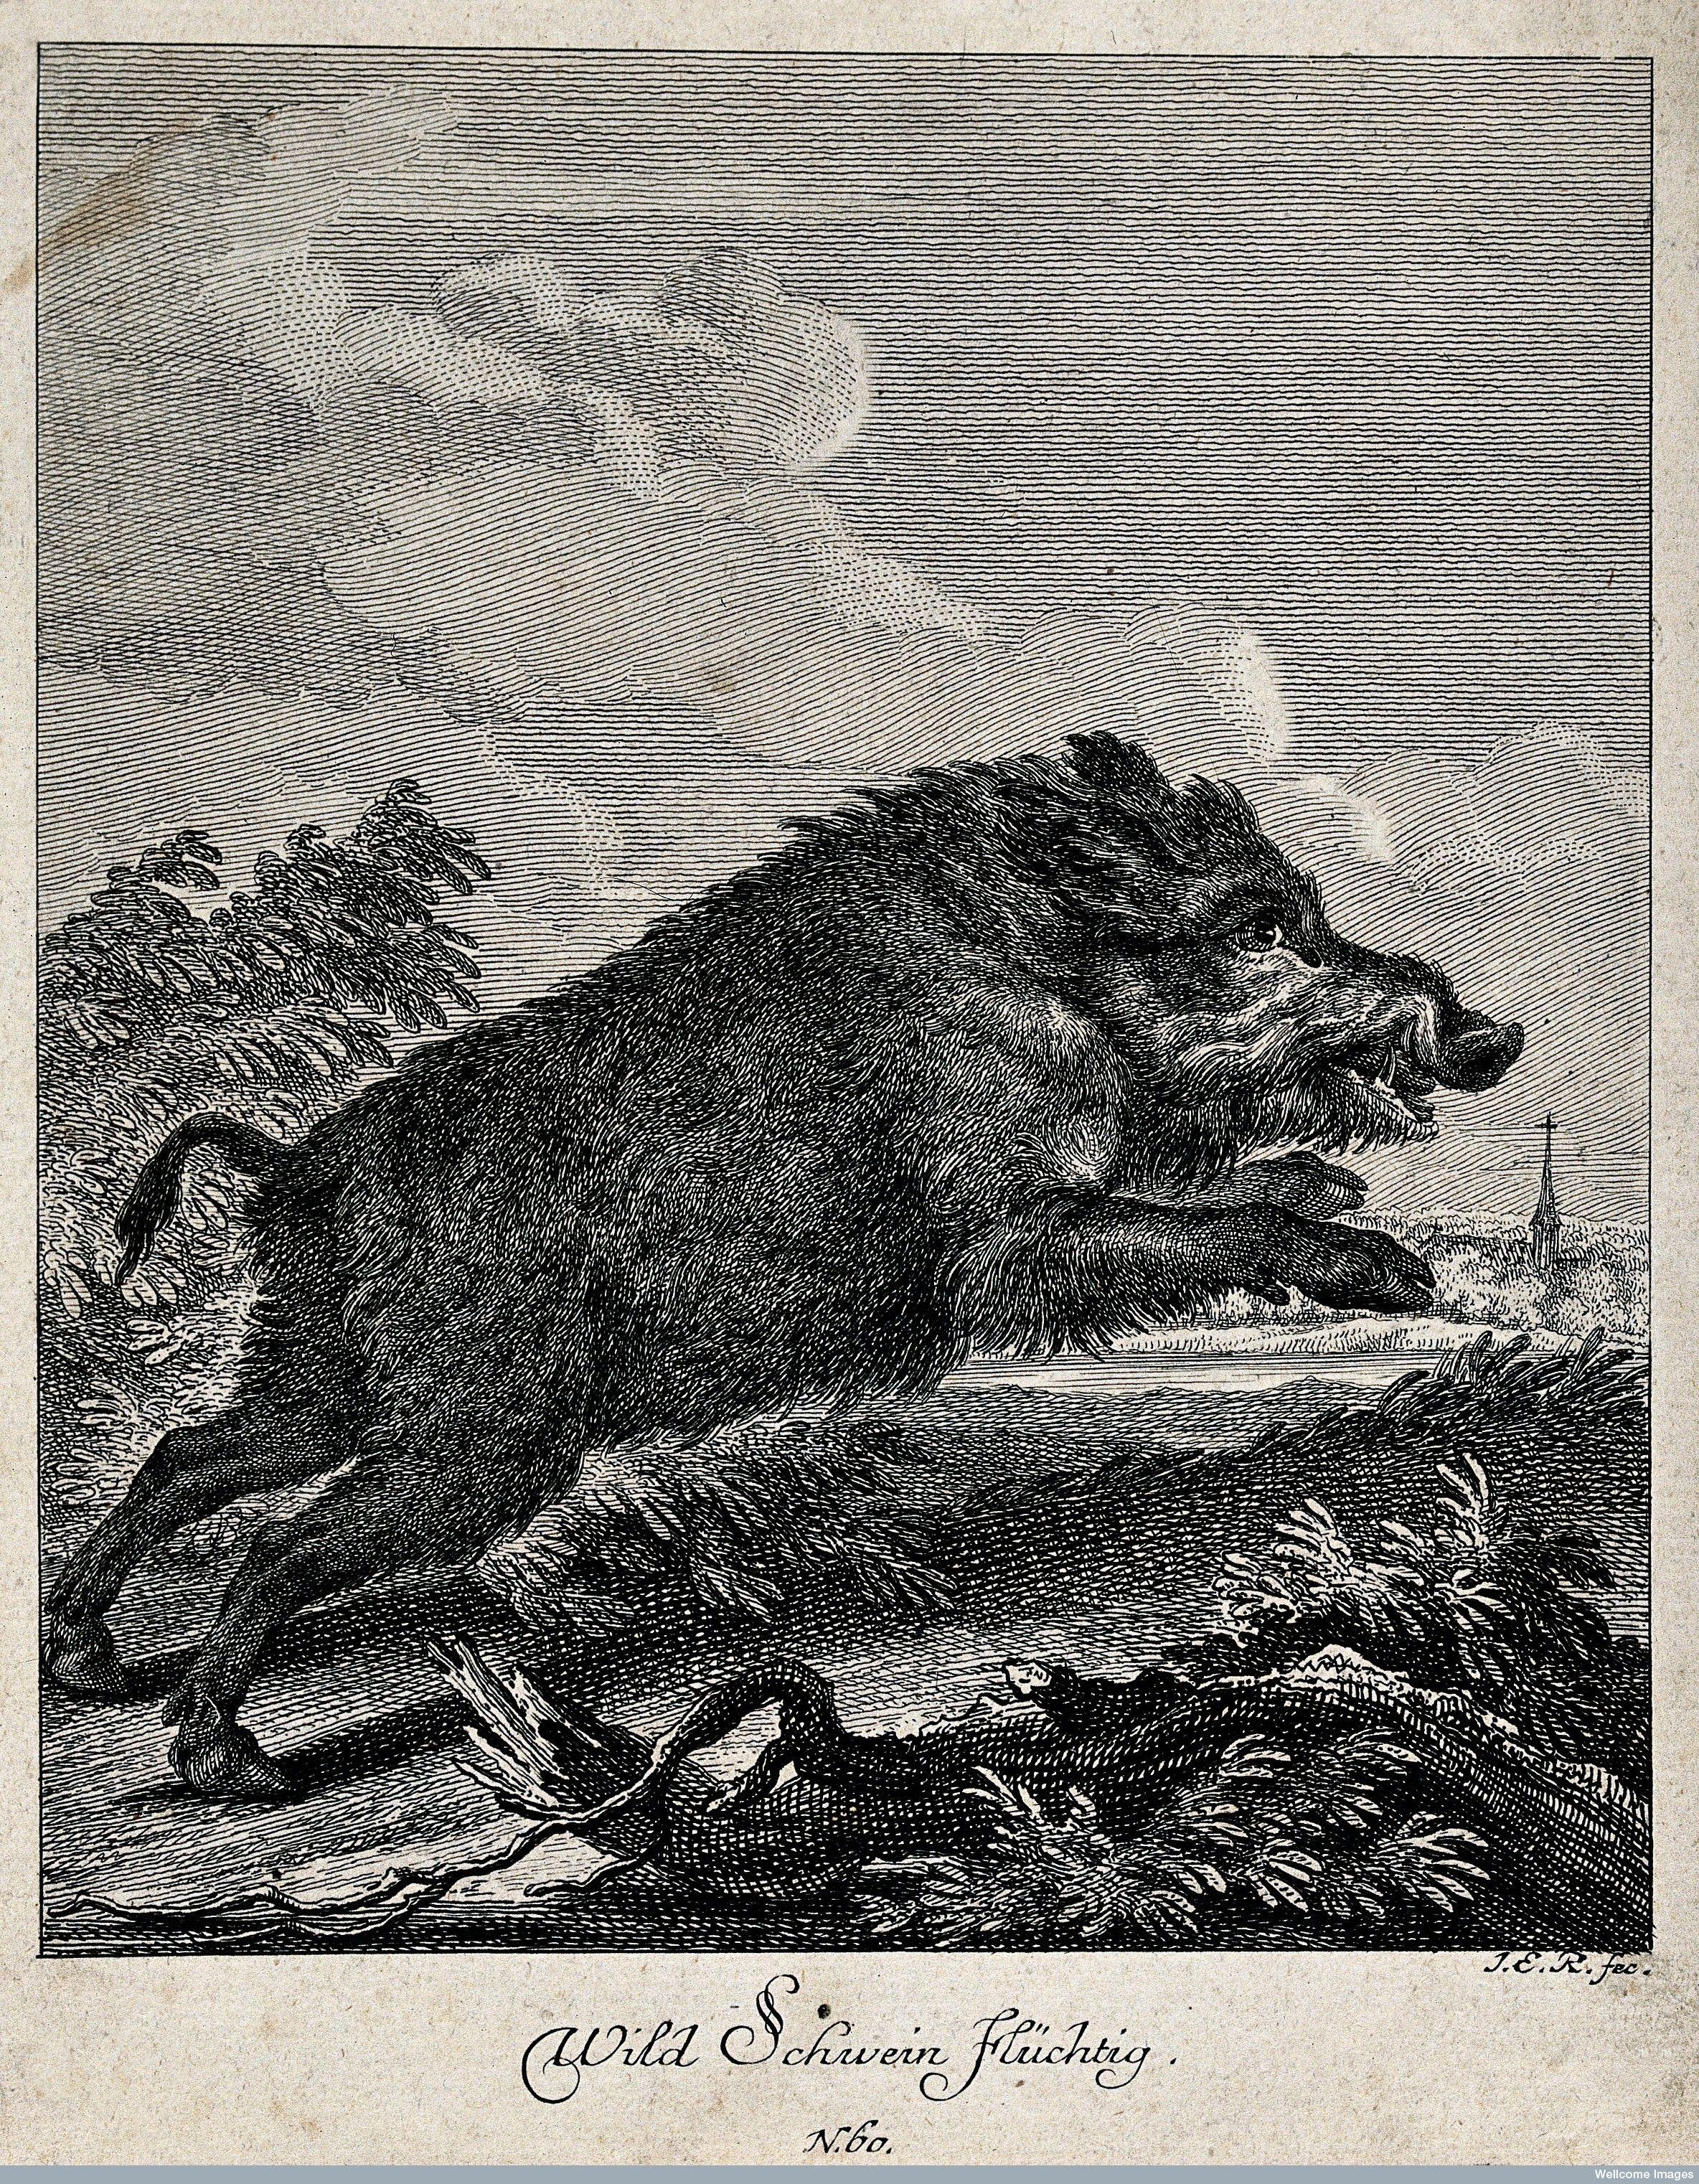 wild boar illustration - Google Search   Art. Art. Art.   Pinterest ...